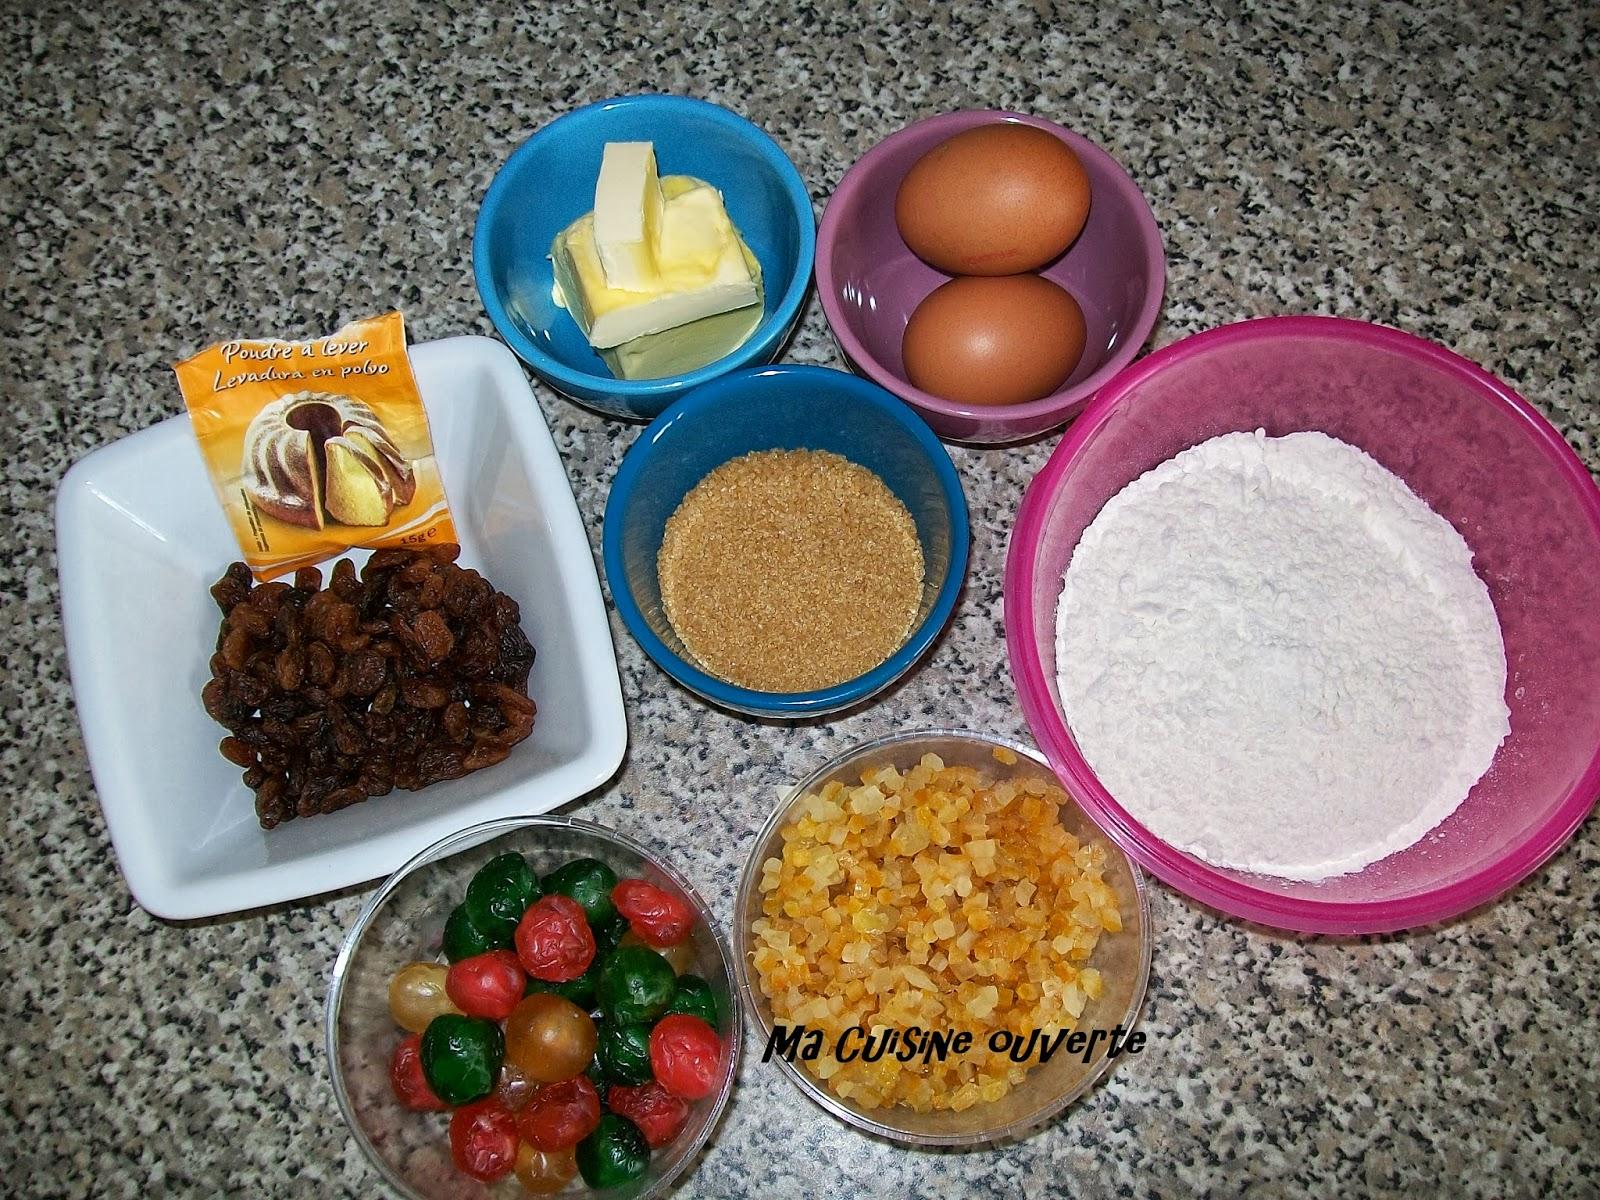 Ma cuisine ouverte english cake for Cuisine ouverte traduction anglais